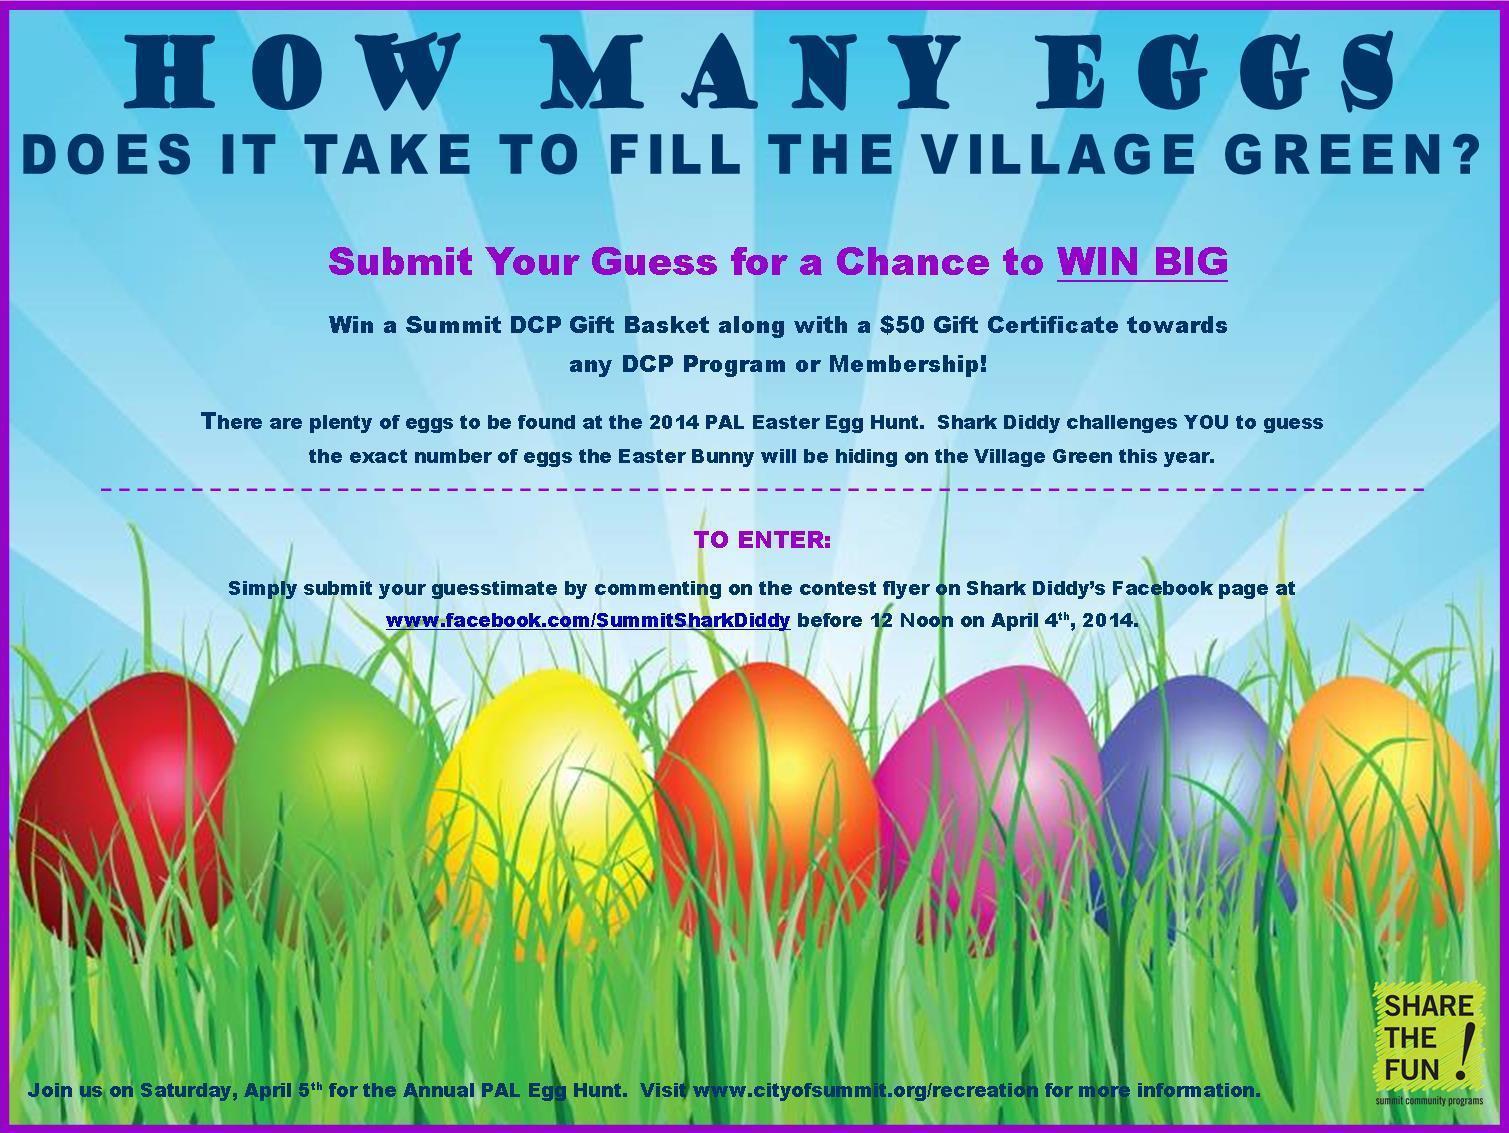 93878e9ff676f0833c4a_How_Many_Eggs.jpg